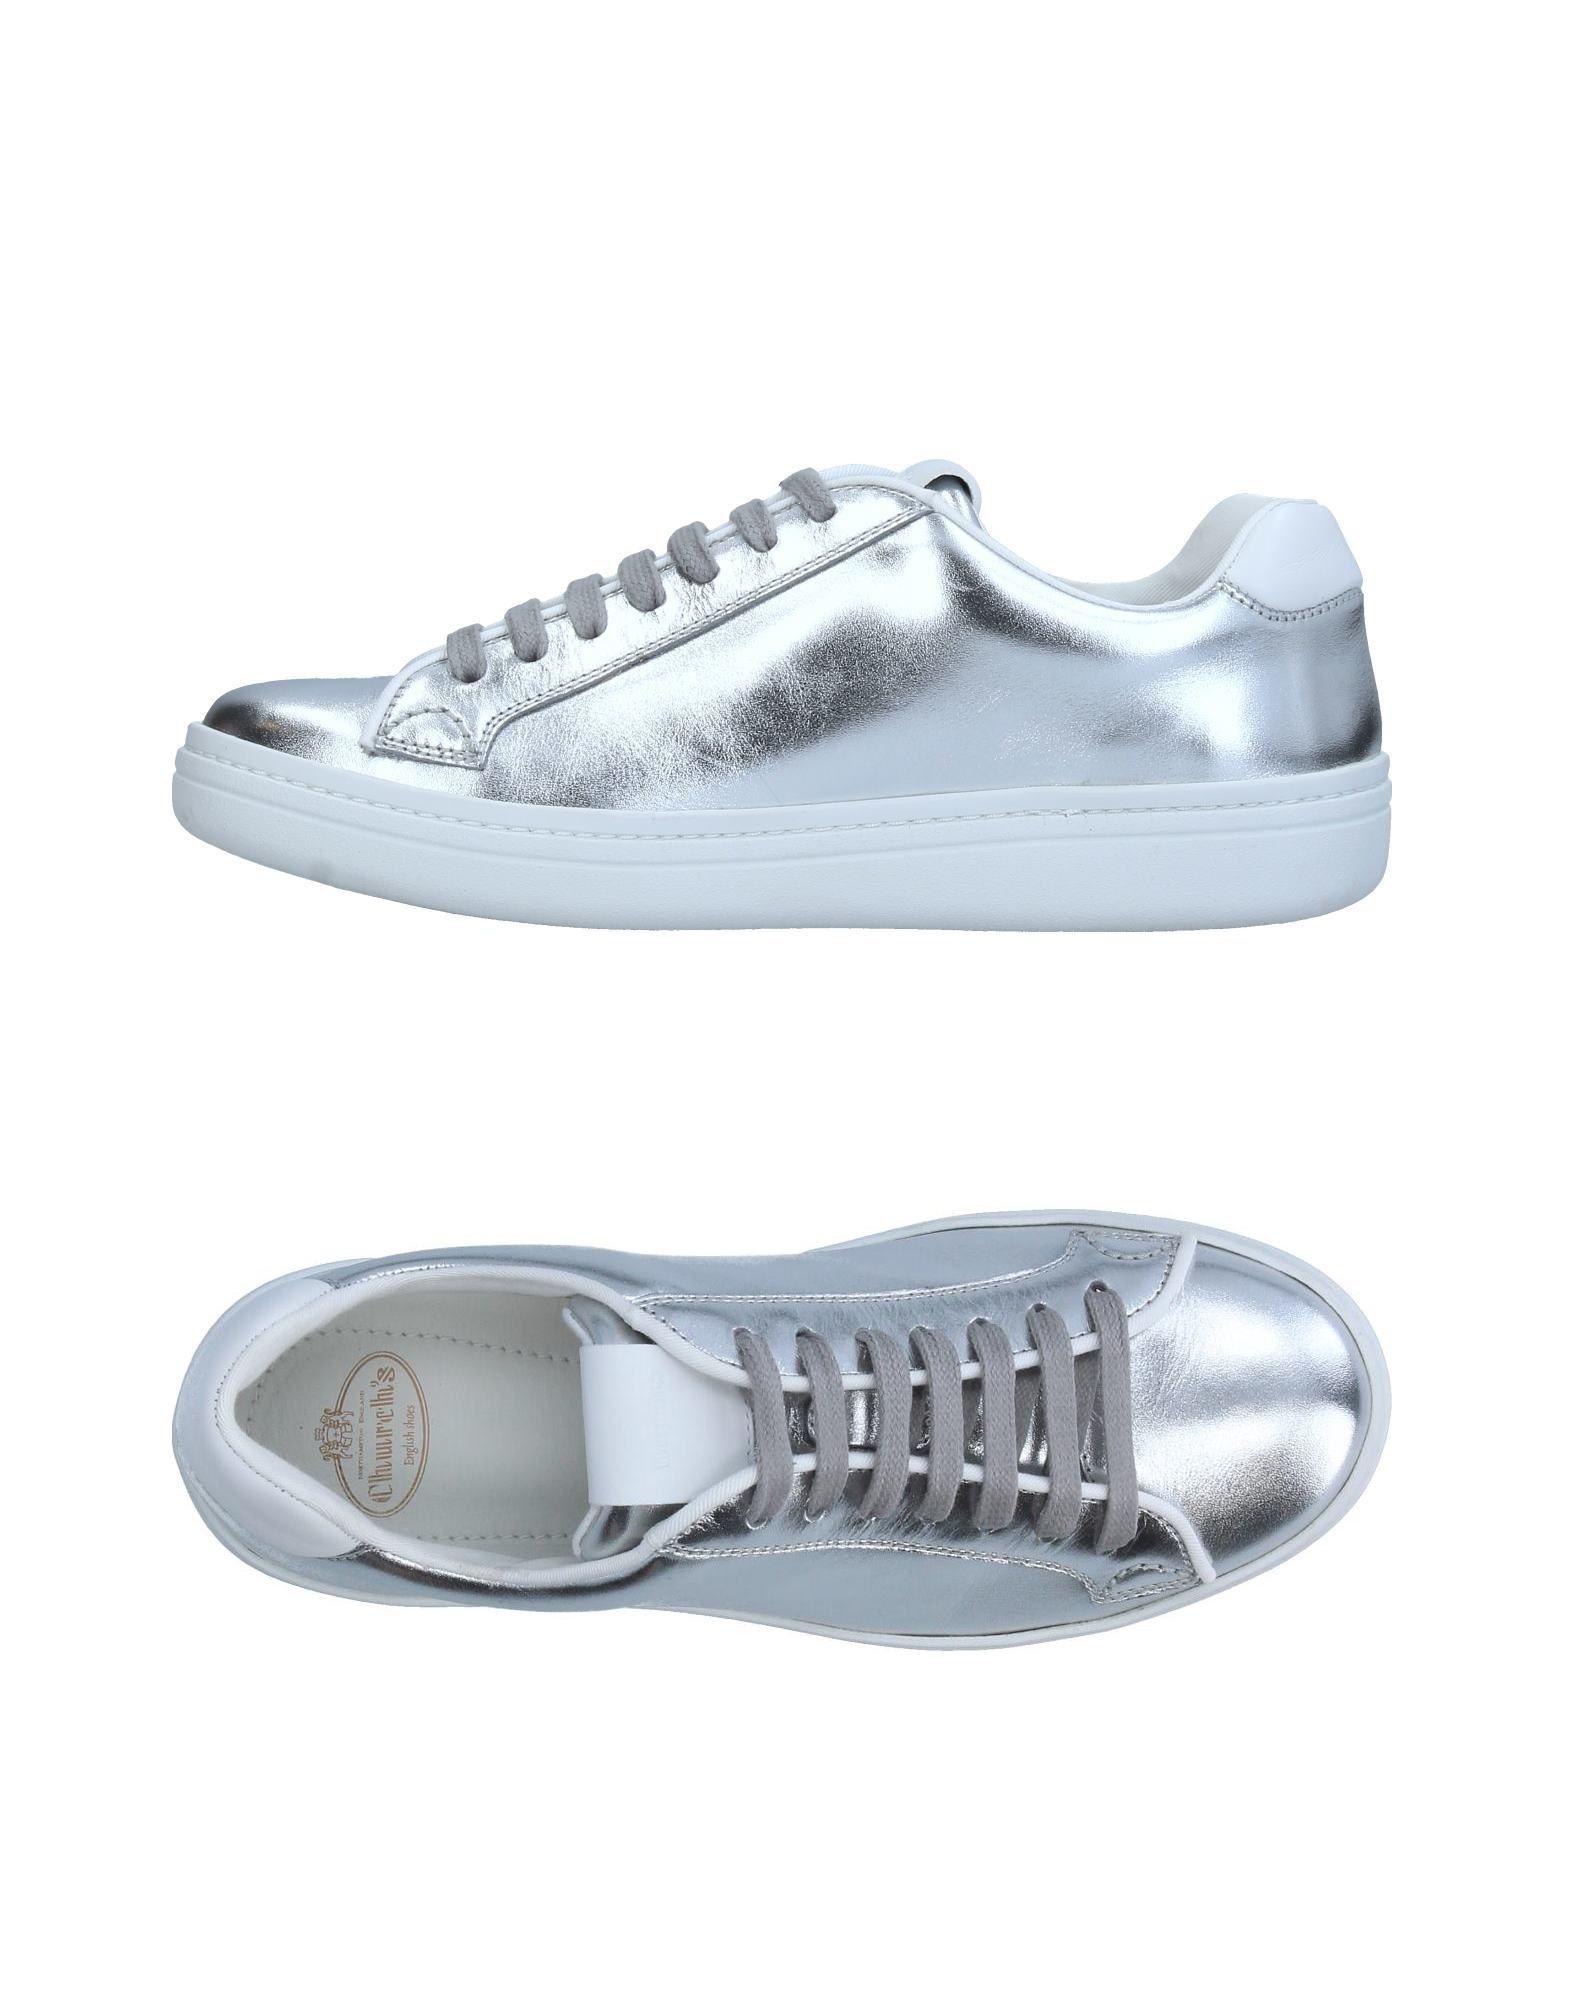 Sneakers Churchs Donna - Acquista online su